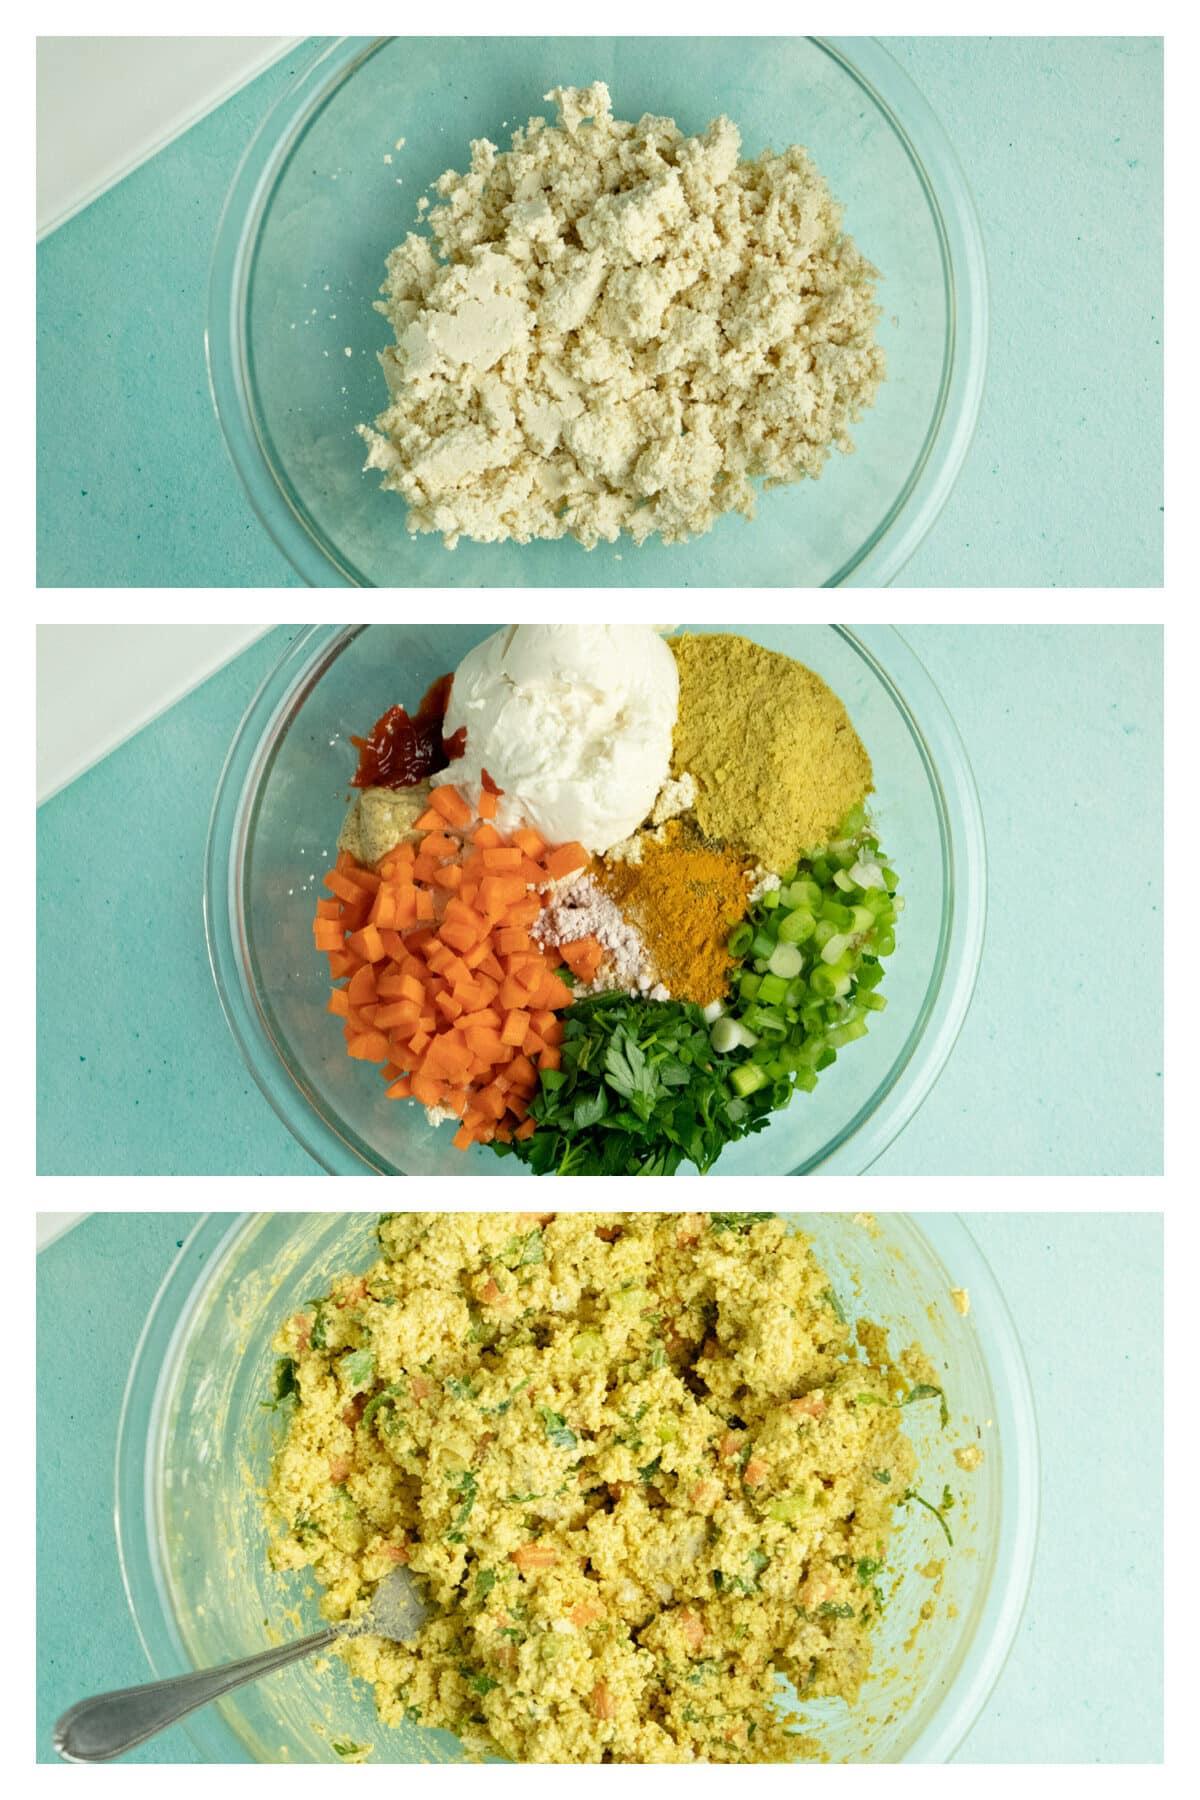 image collage showing tofu egg salad prep